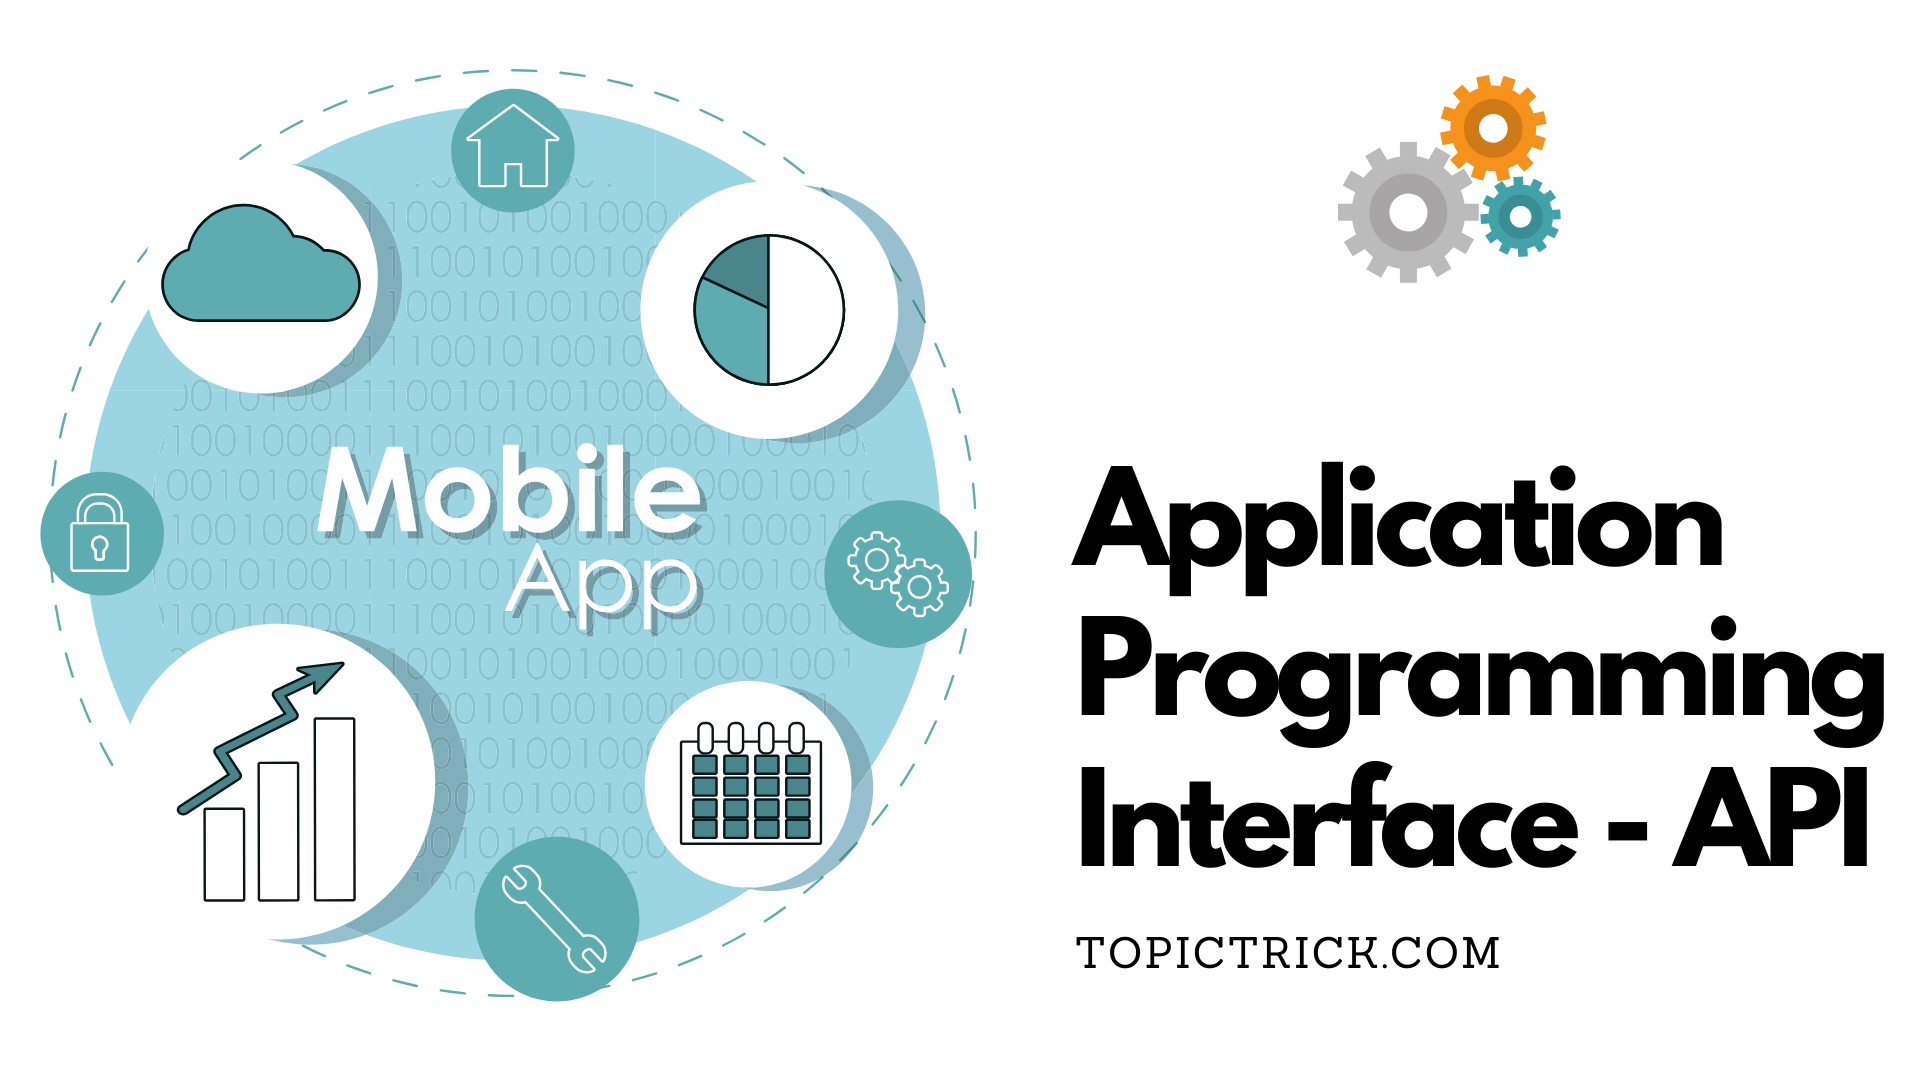 Application Programming Interfaces (API) – REST, SOAP, WEB API, Microservice. Easy 10 Min Read.